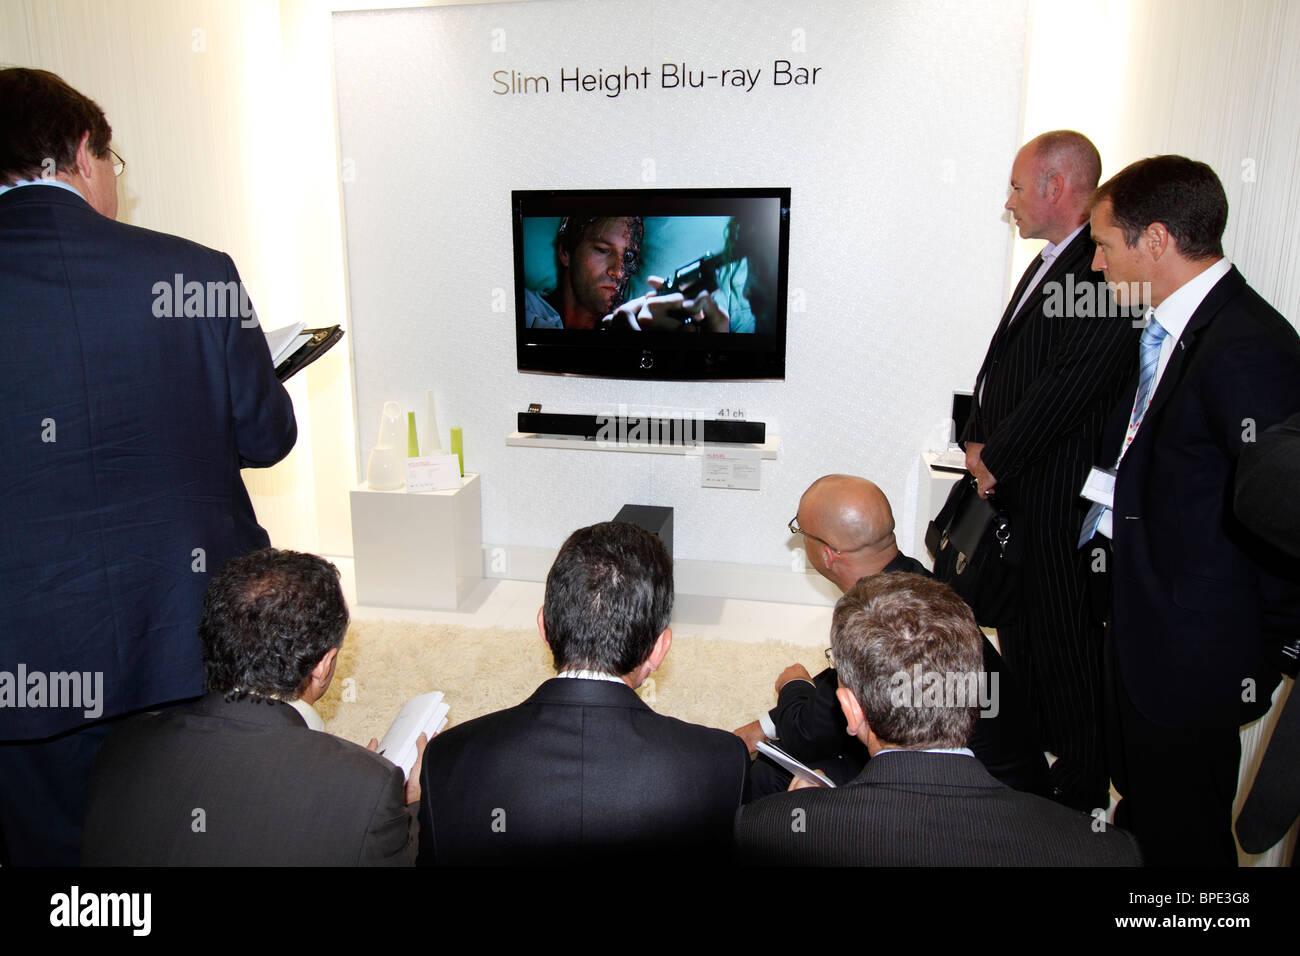 Berlin, IFA, Consumer Electronics Unlimited, Slim Height Blu-ray in a presentation, exibitor LG. EU/DE/DEU/Germany - Stock Image